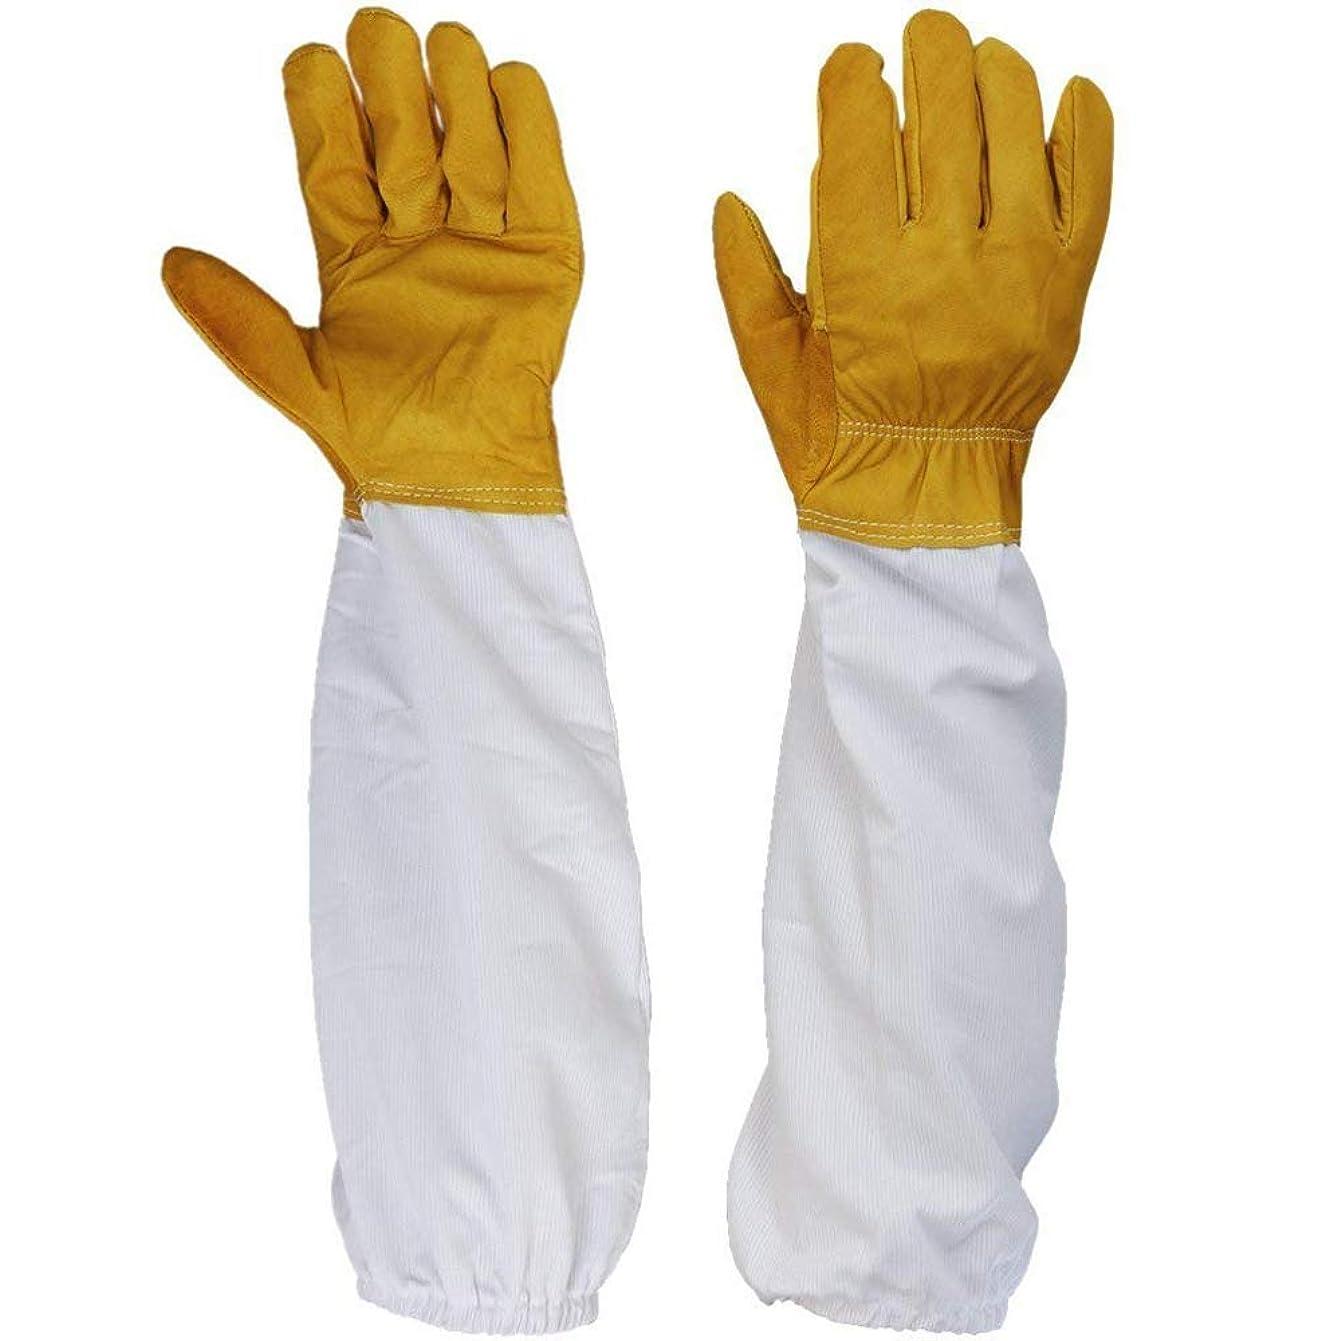 Onior 1ペア便利な実用シープスキン換気布保護手袋長袖養蜂用手袋虫除け芝刈り用芝刈り機の取り外しに適した